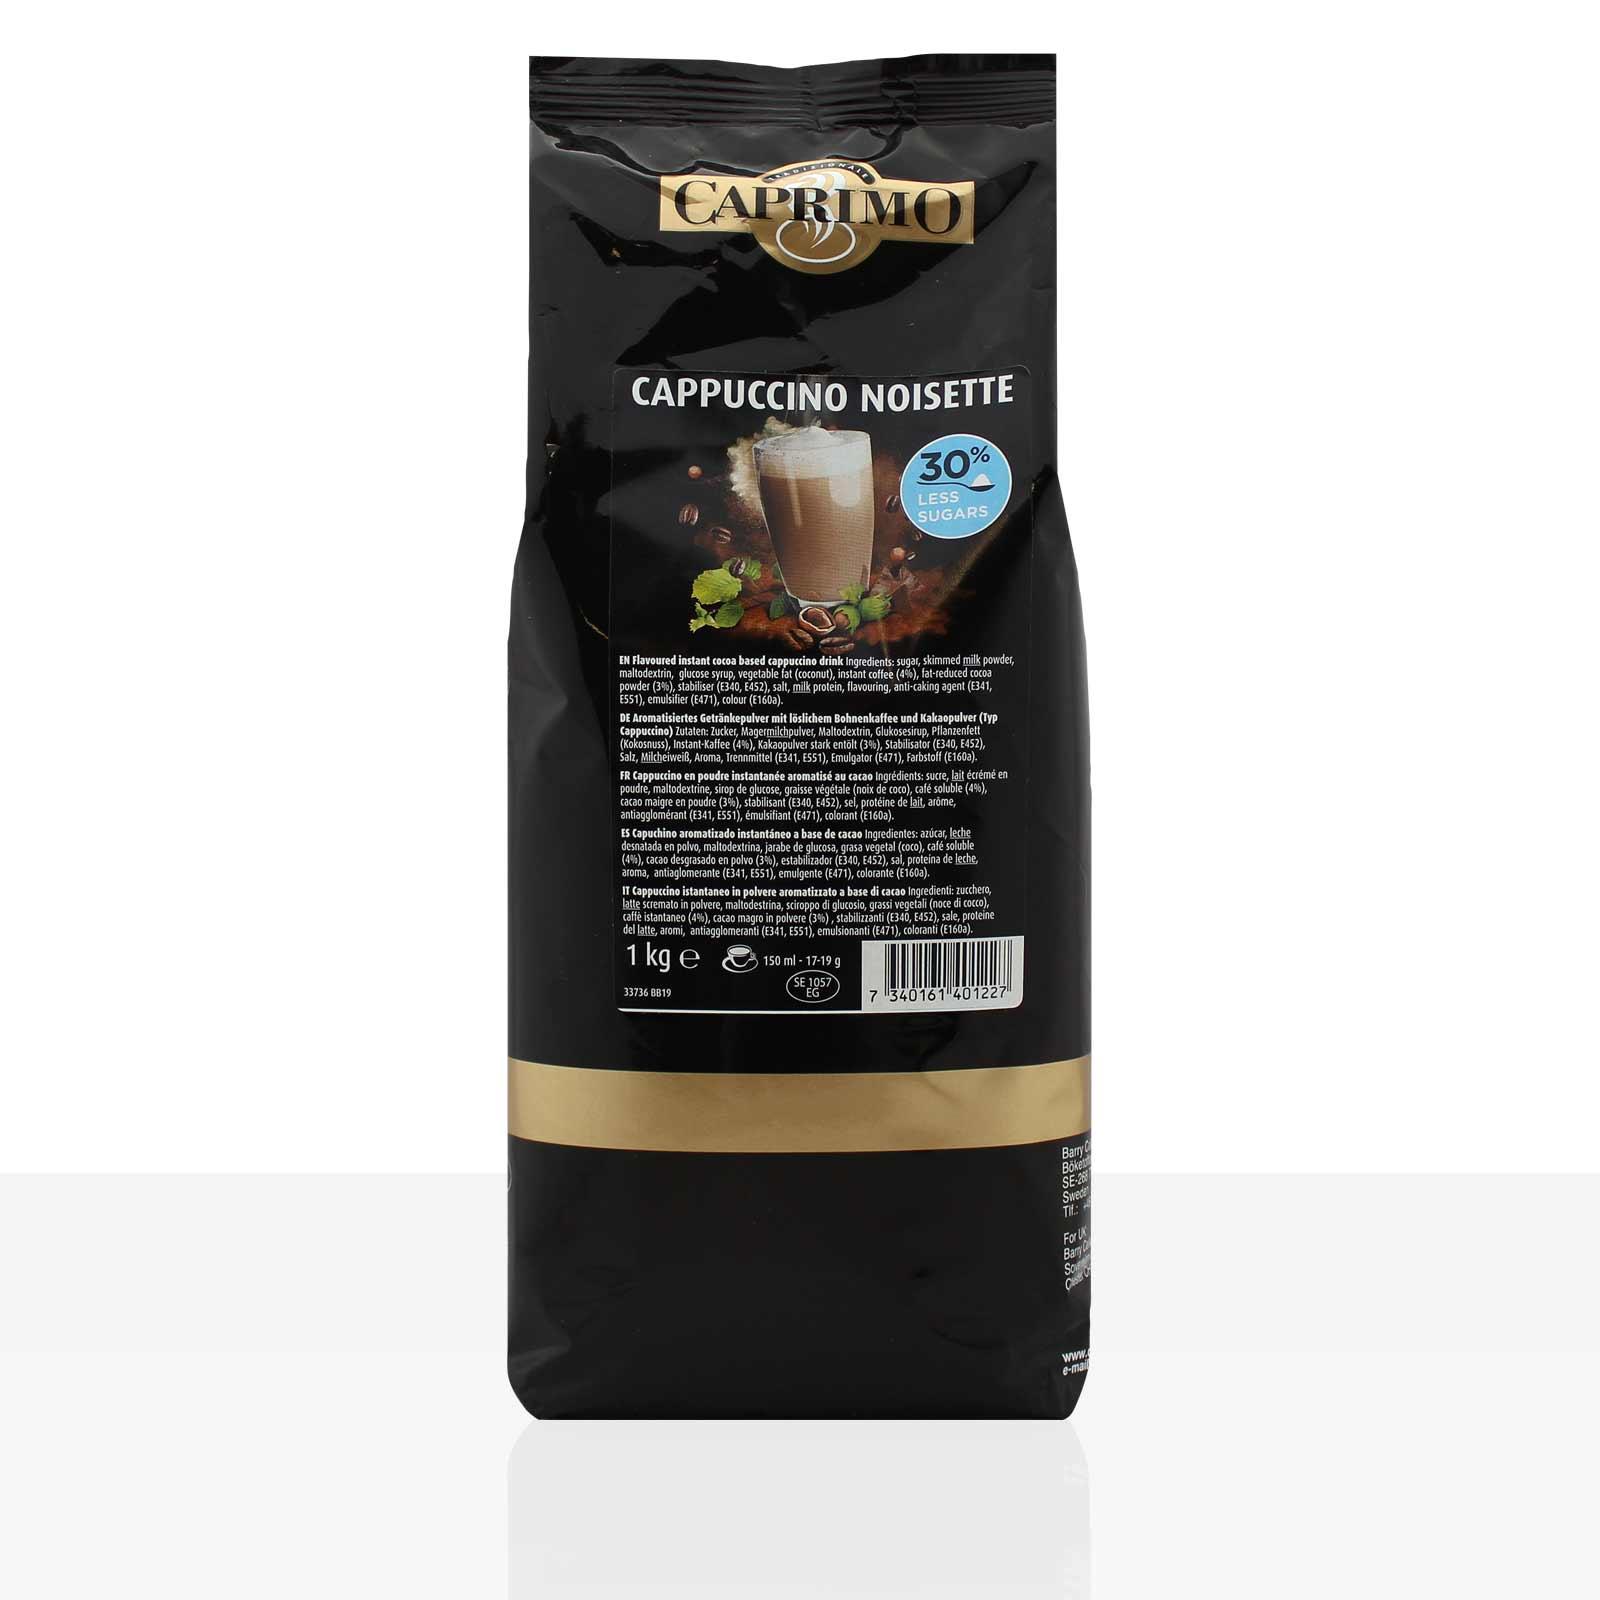 Caprimo Cappuccino Cafe Noisette 10 x 1kg